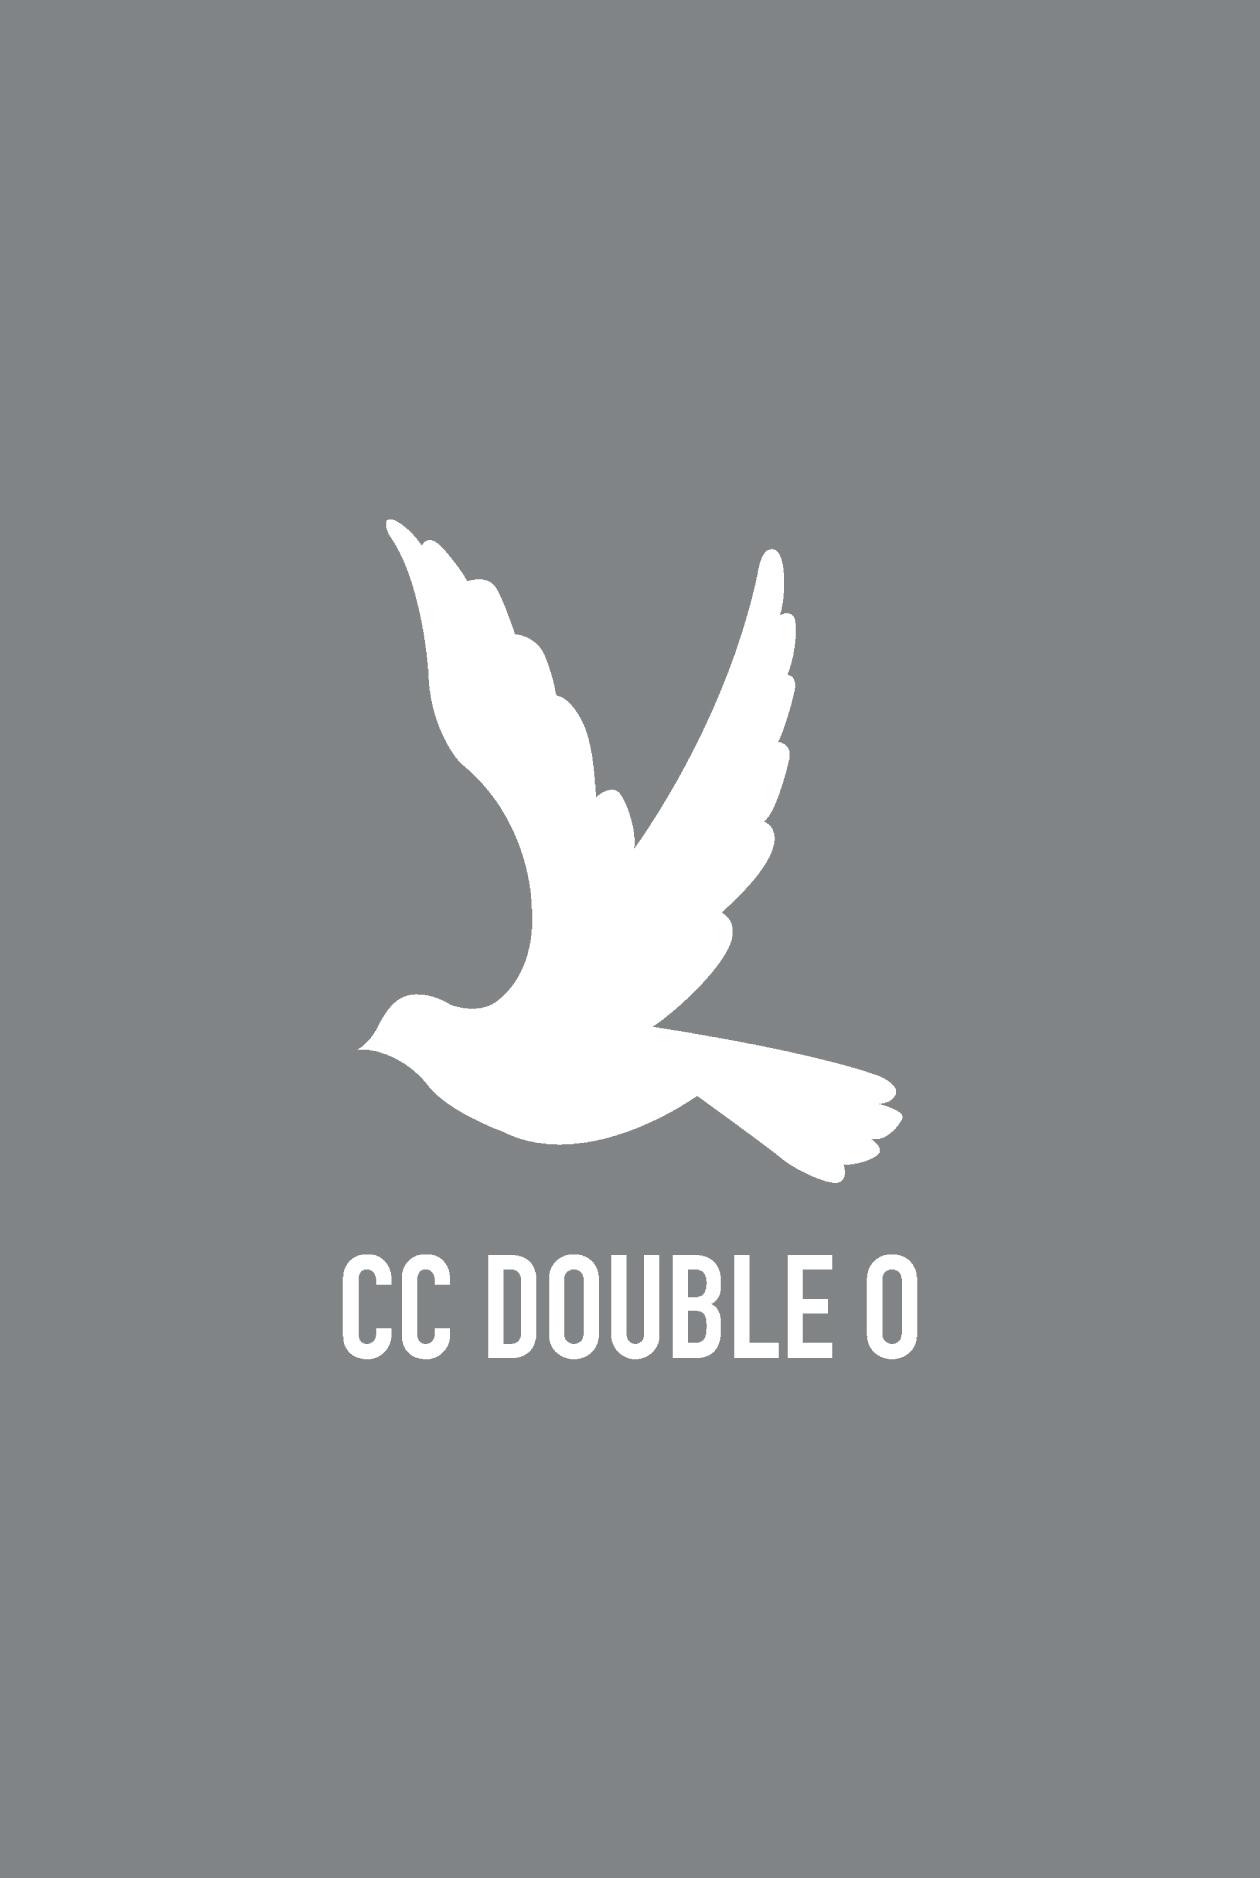 Sleeveless Polo with CC DOUBLE O Collar Detail